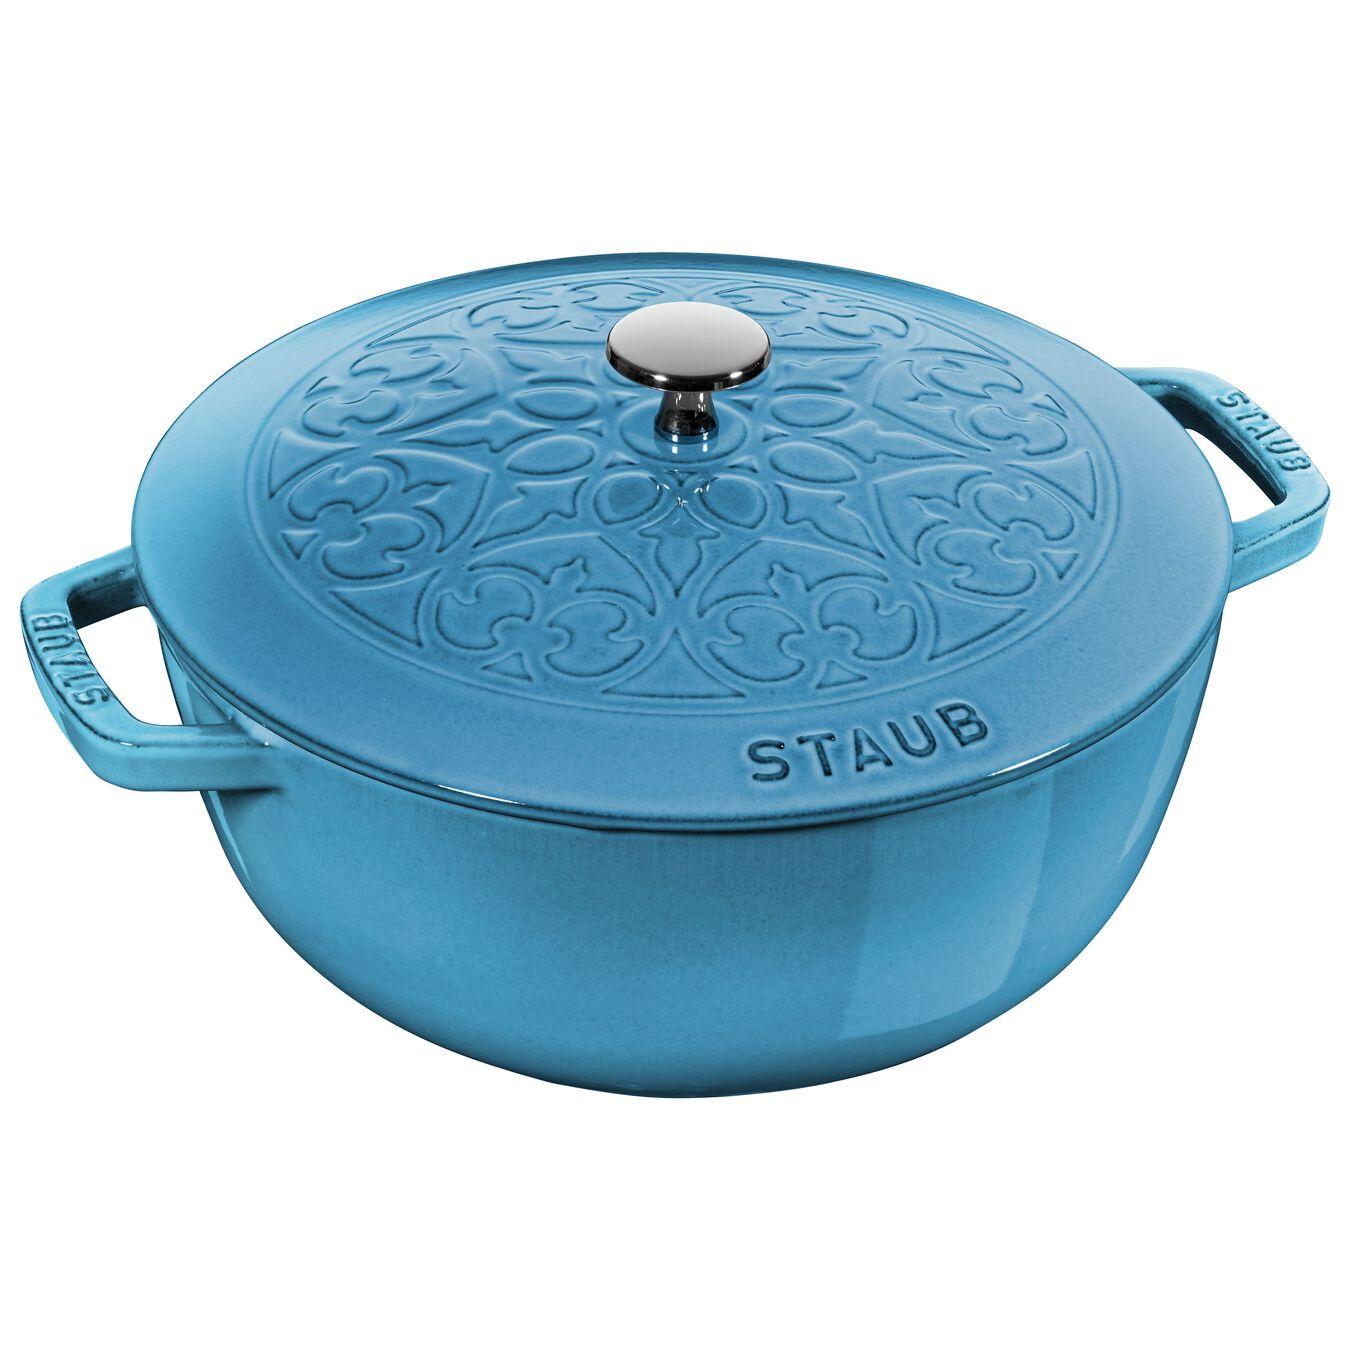 Pot set, lily decal, 2 Piece   round   cast iron   ice-blue,,large 2